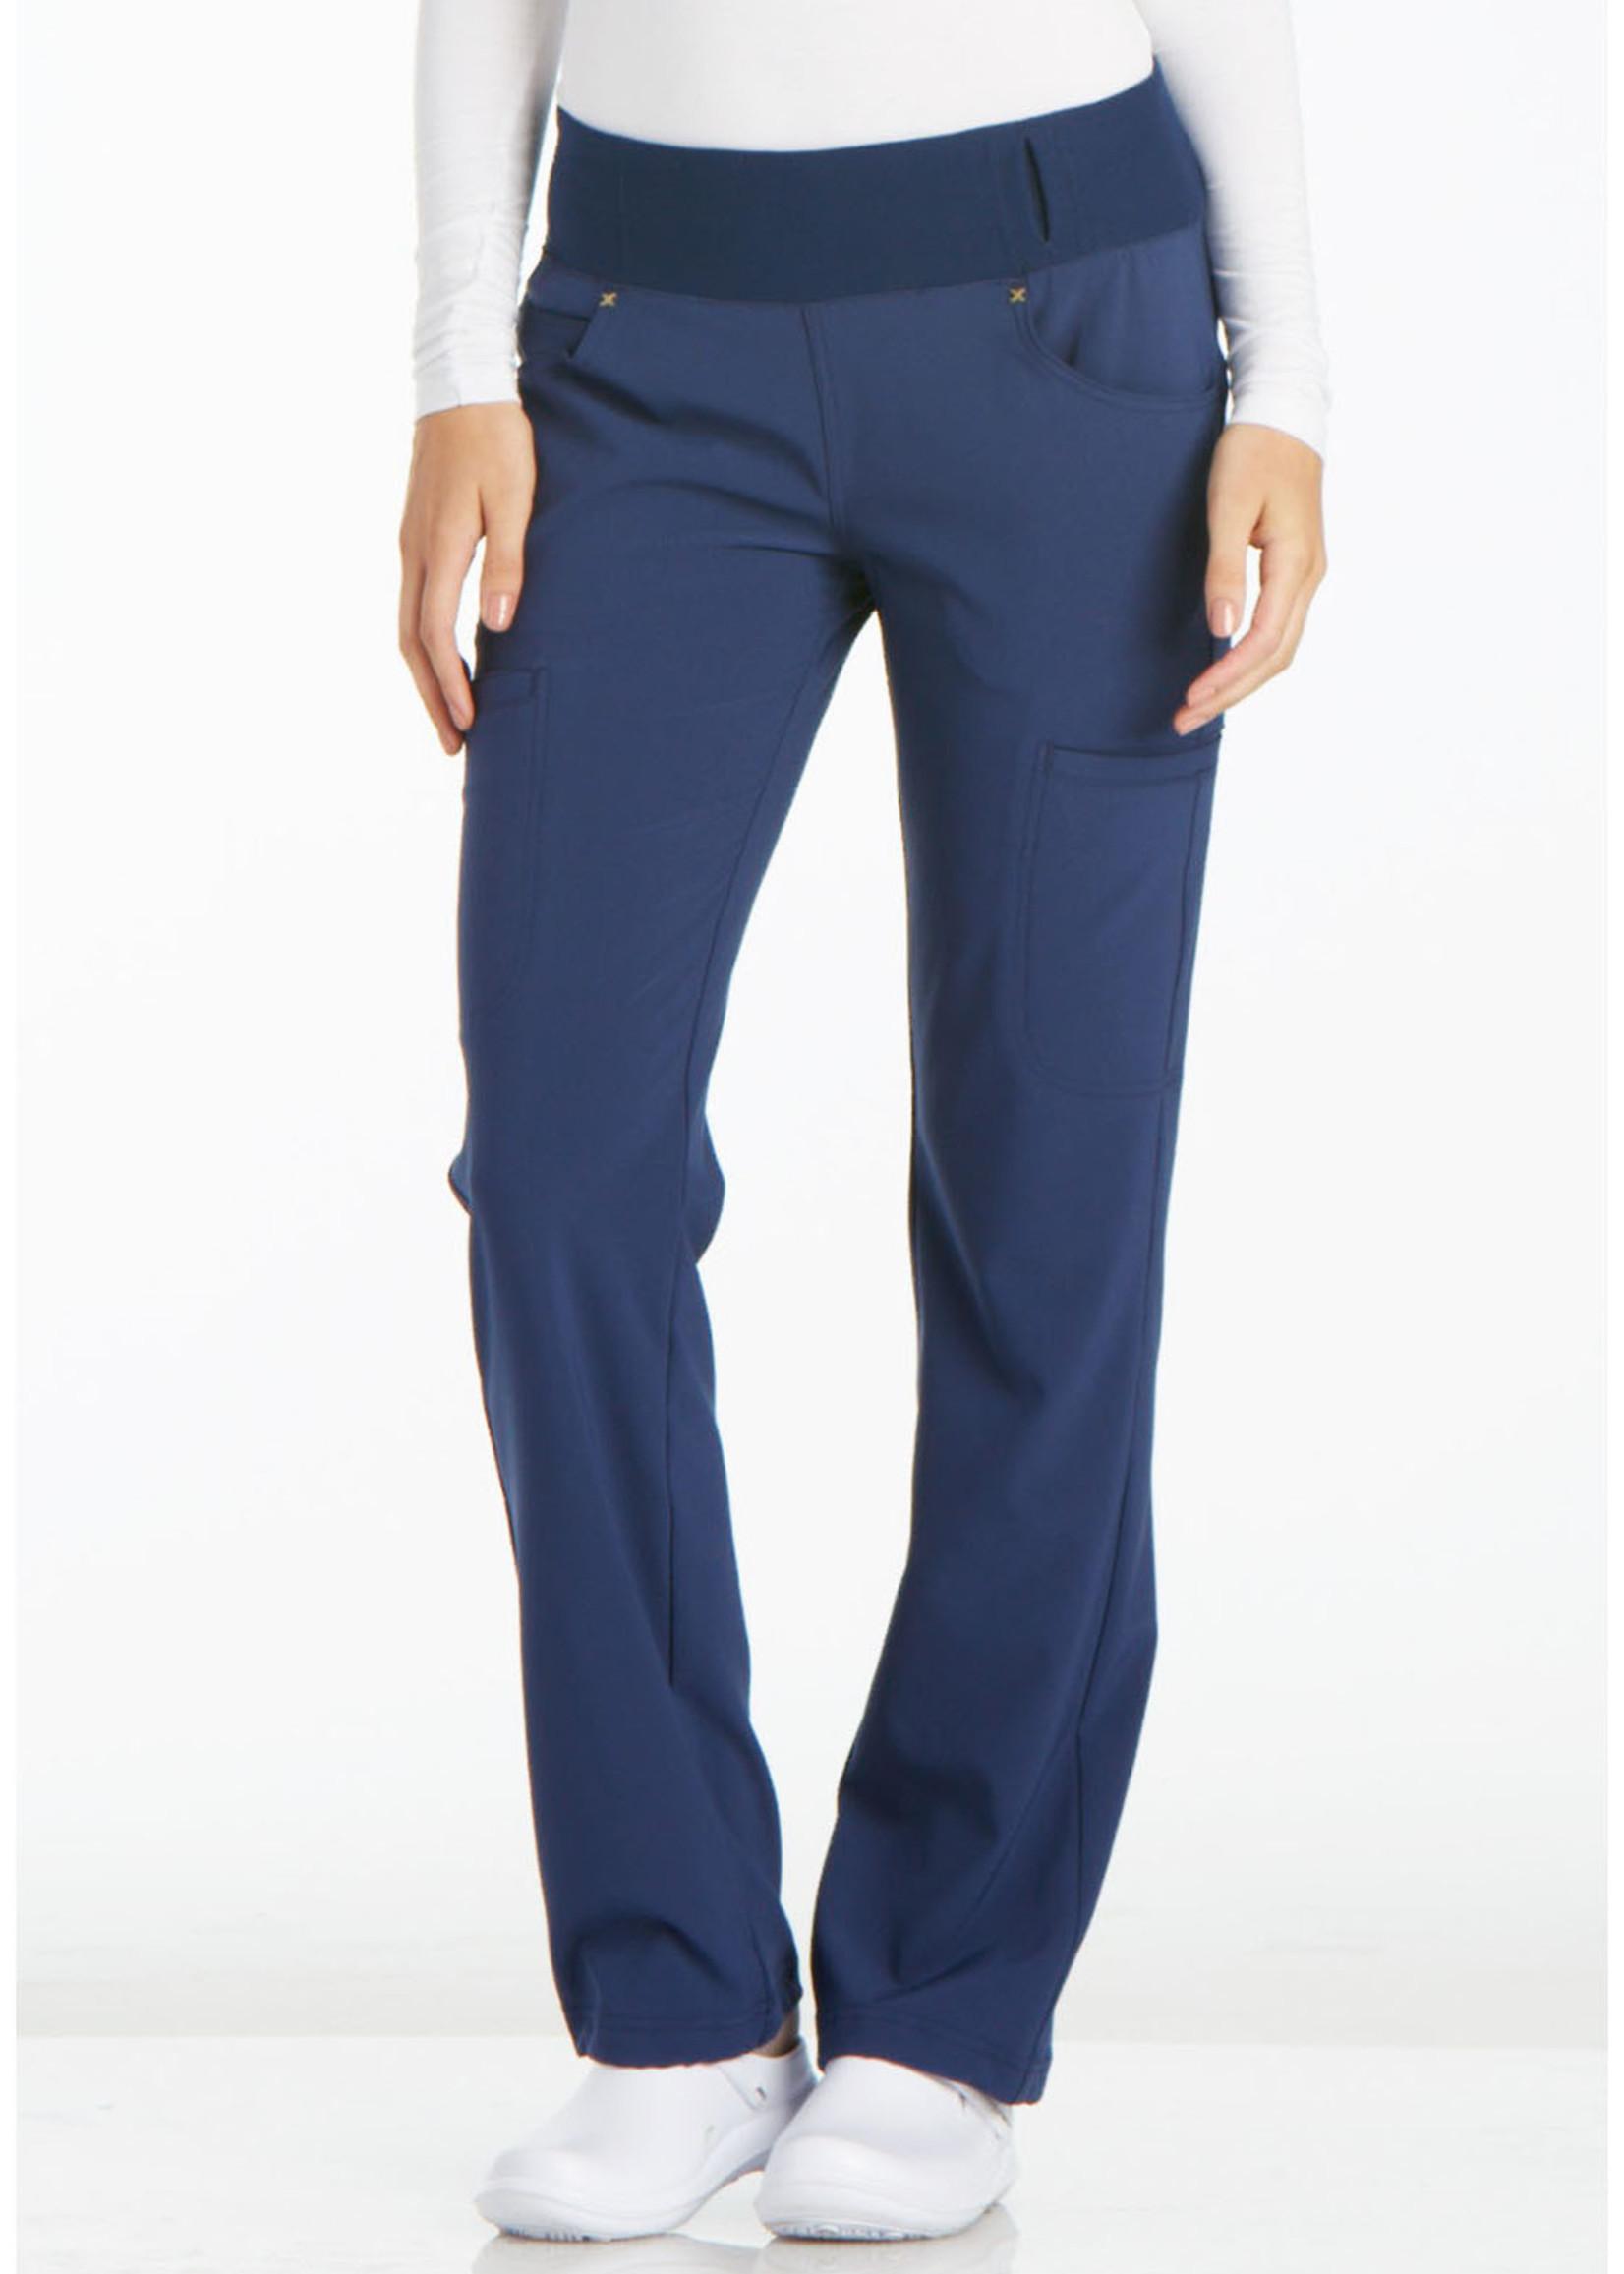 Mid Rise Straight Leg Pull-on Pant - Cherokee Pant CK002